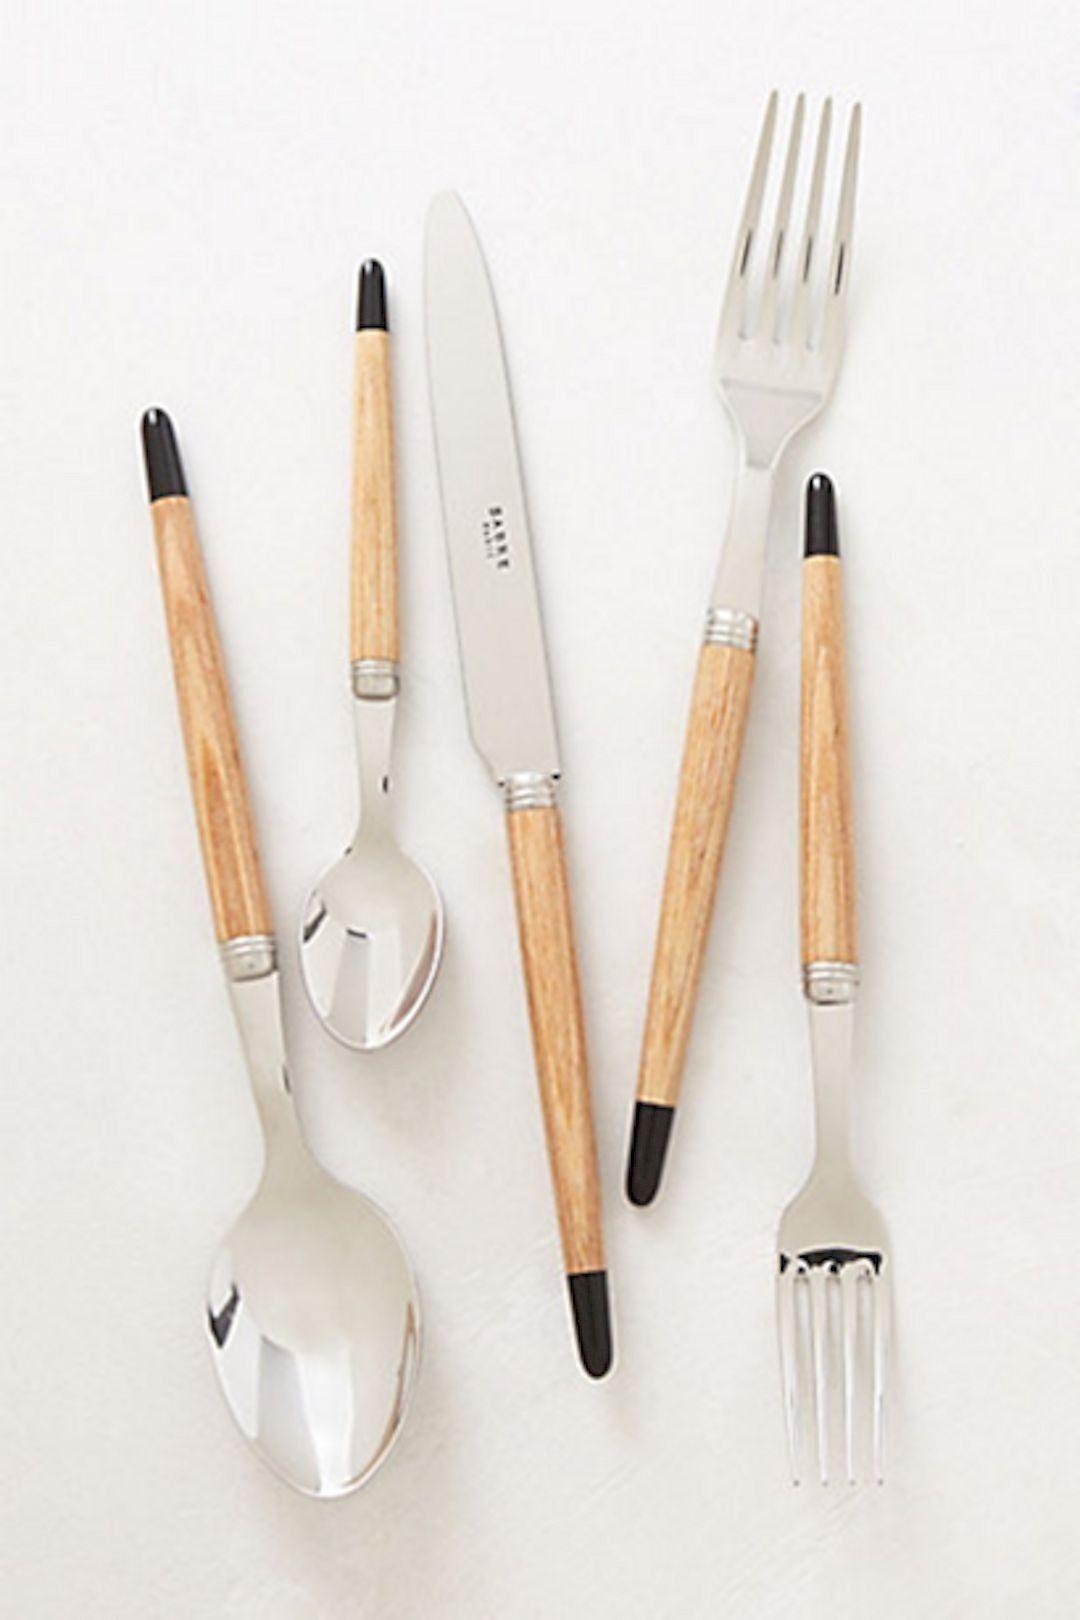 39 Beautiful Flatware Designs Flatware Cutlery Set Kitchen Accessories